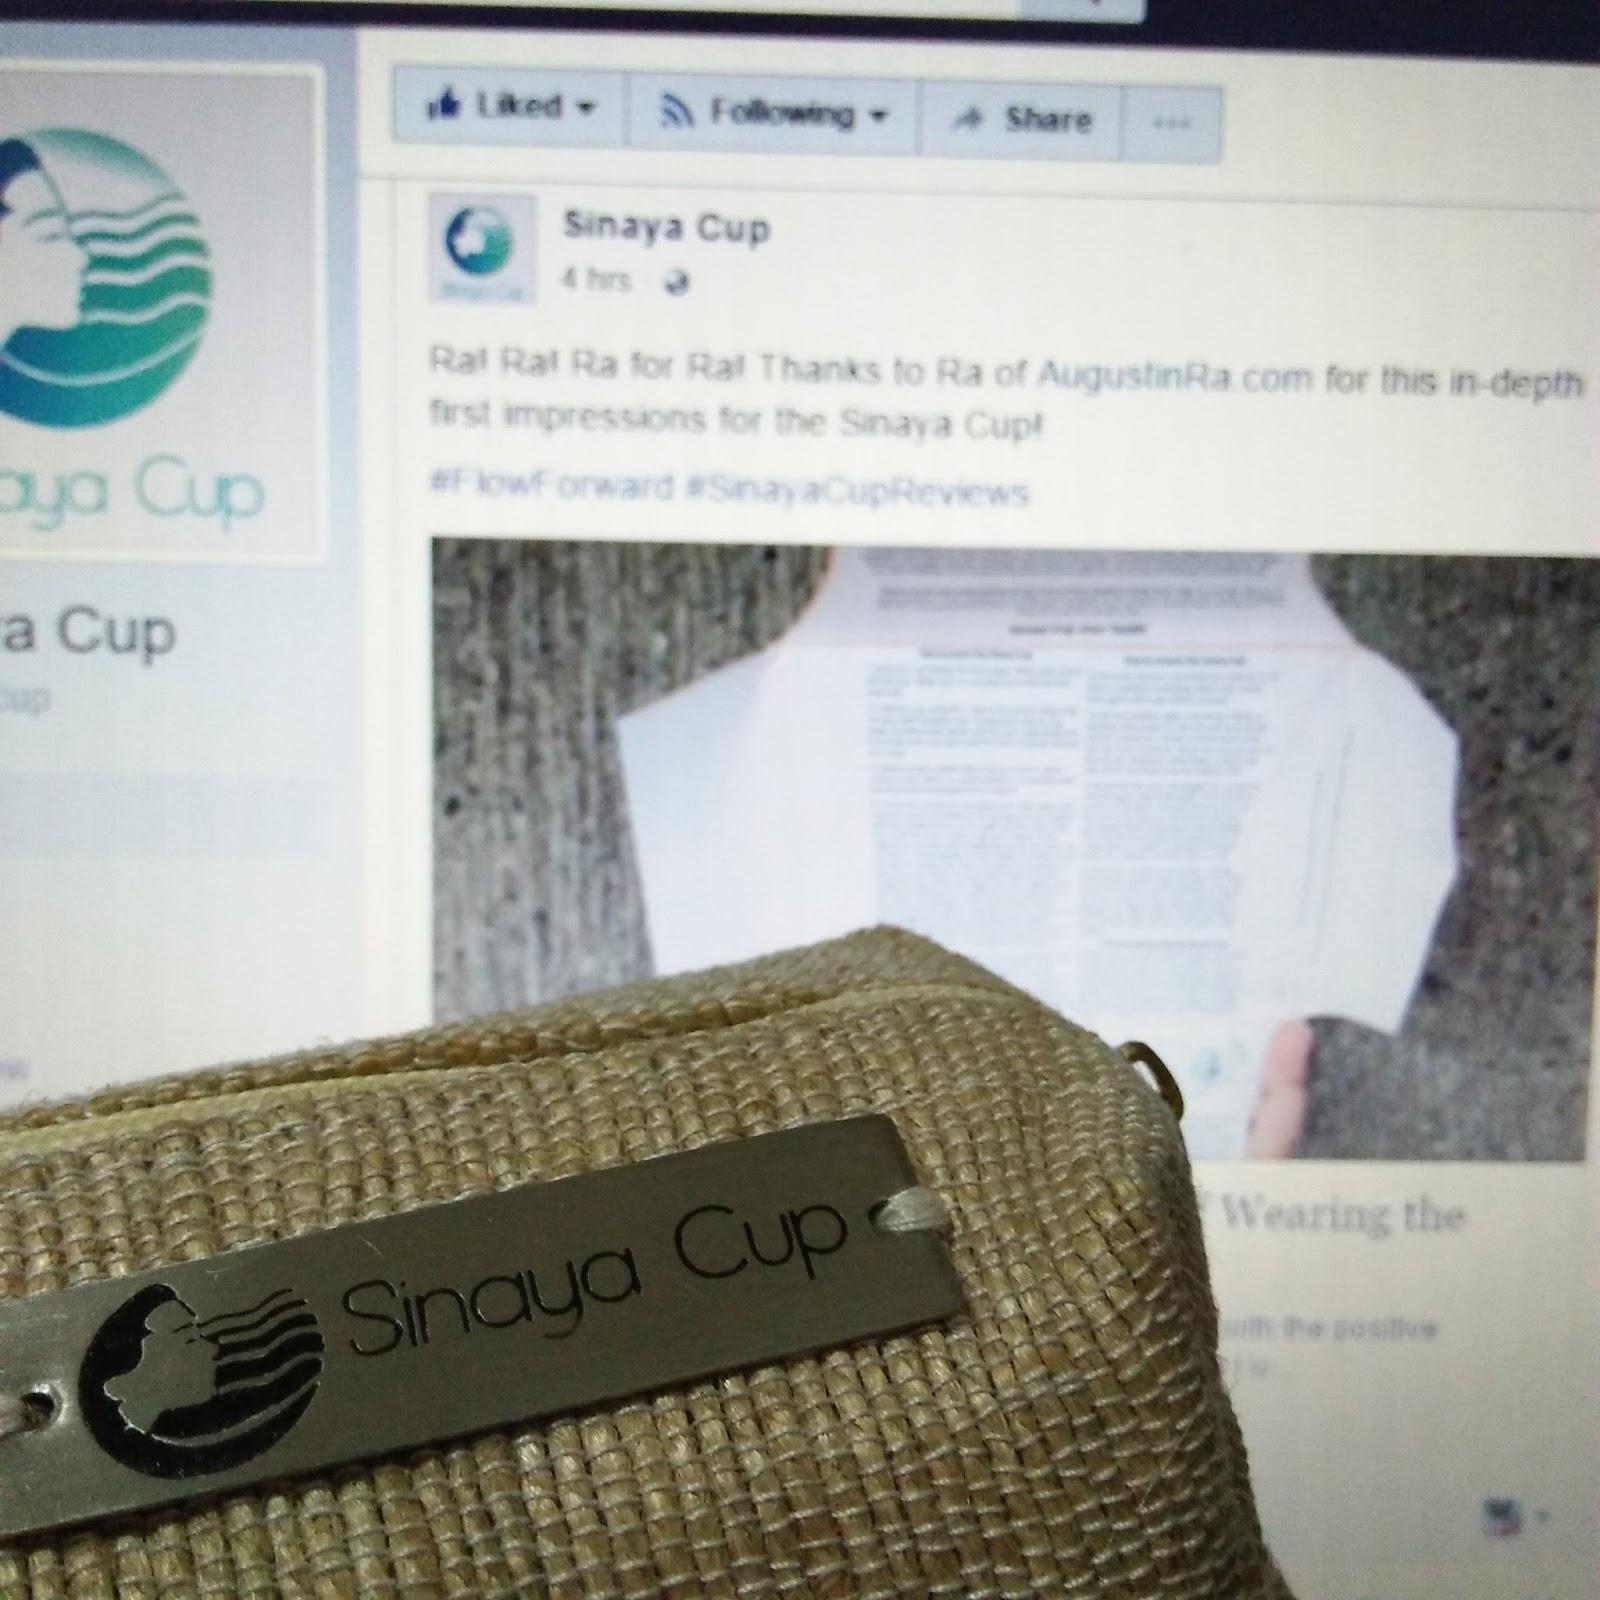 Sinaya Cup